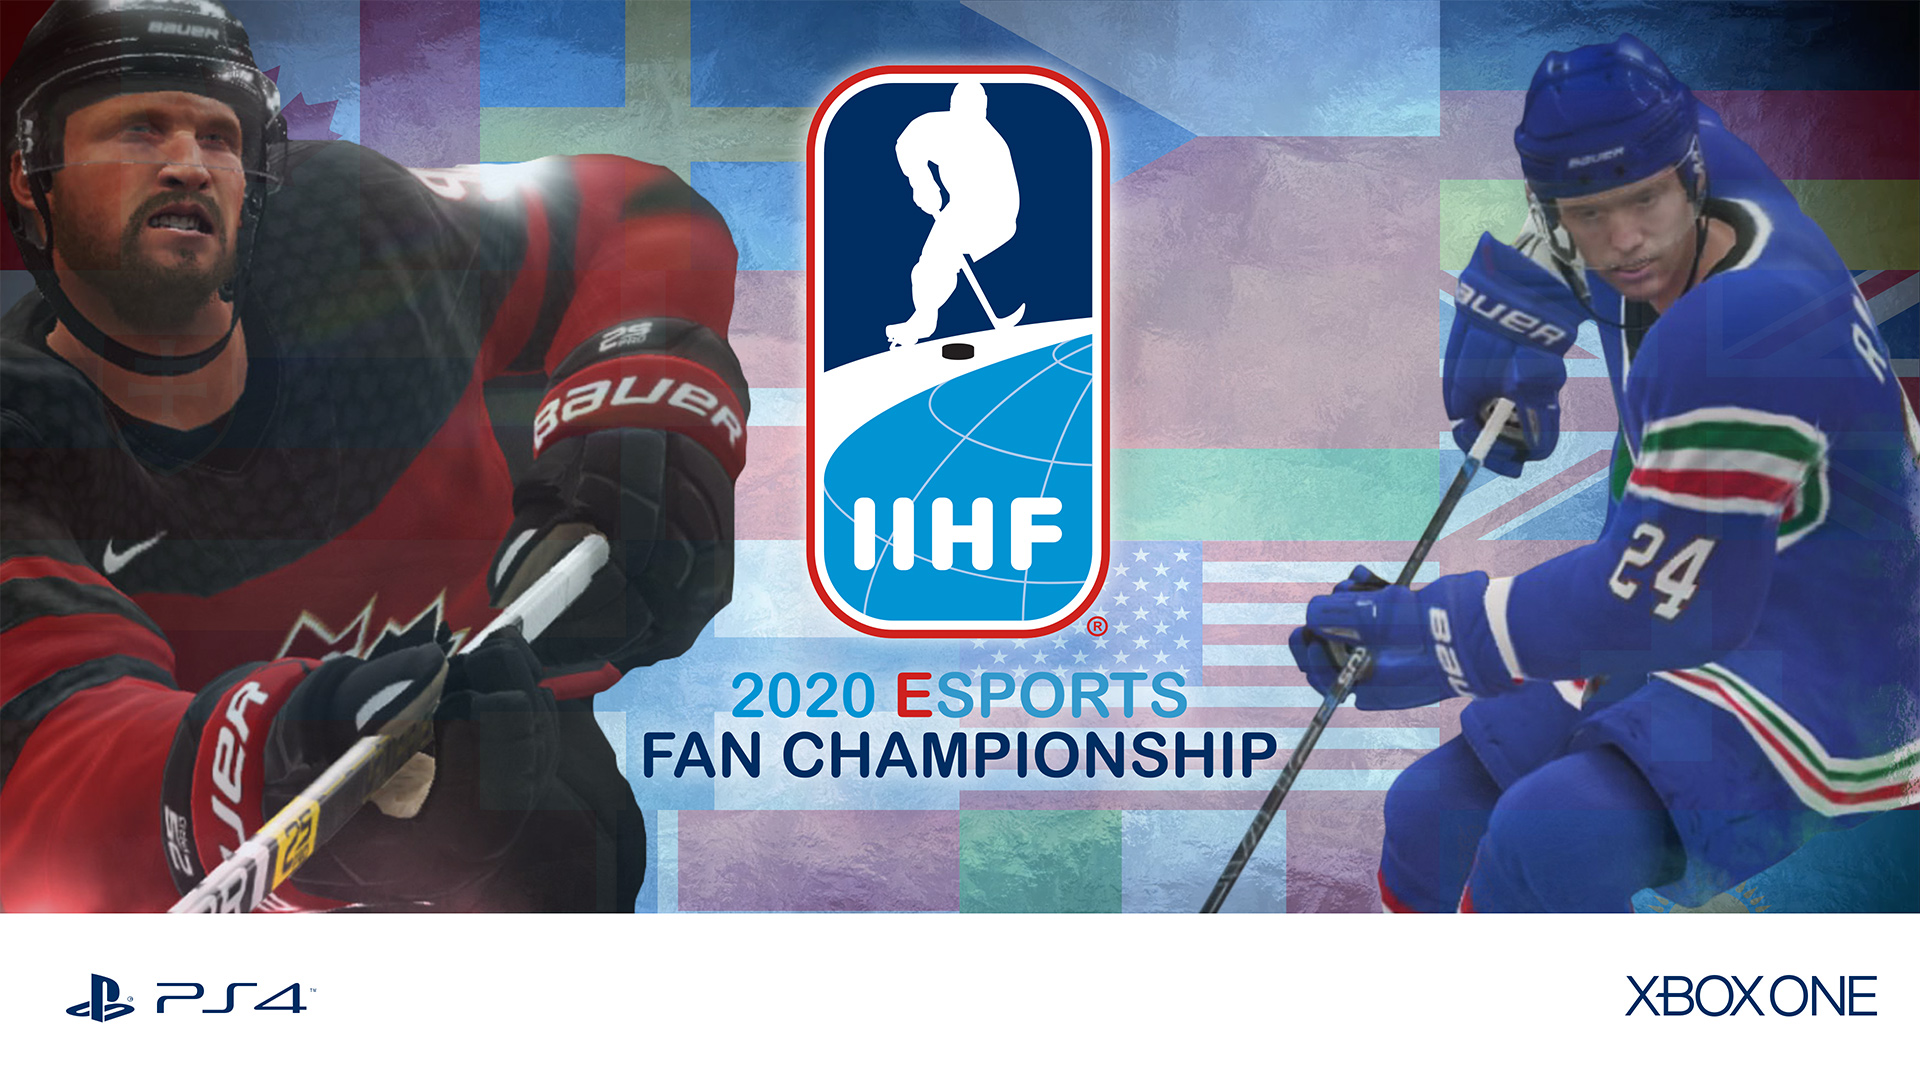 Esports_Fan_Championship_IIHF_cover.jpg